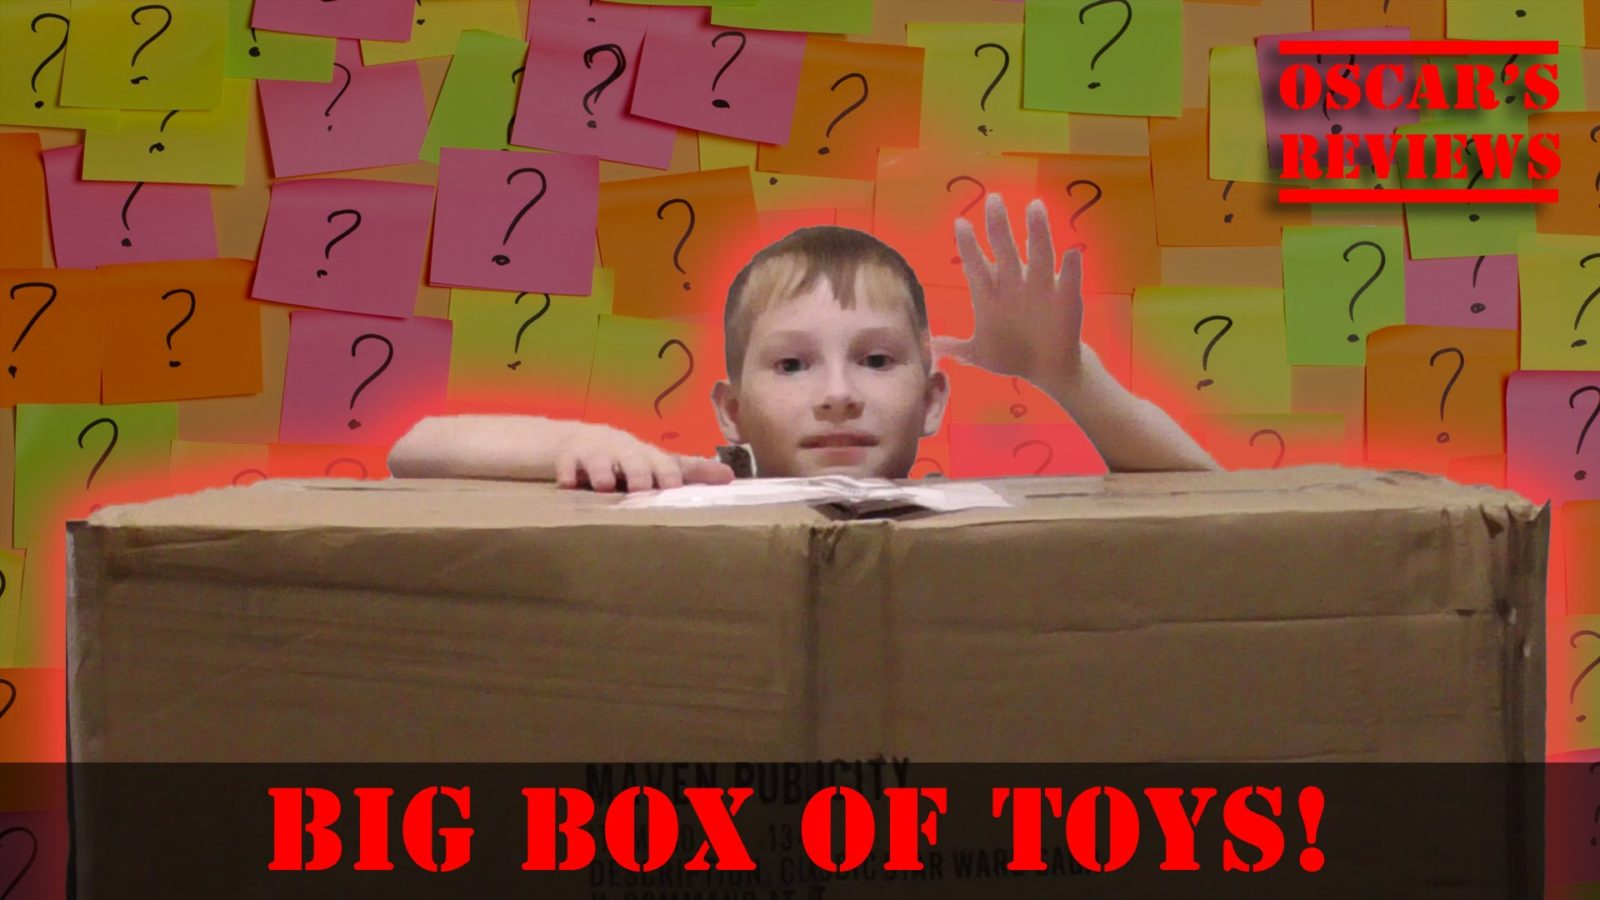 Gigantic, Mystery Box of Toys!